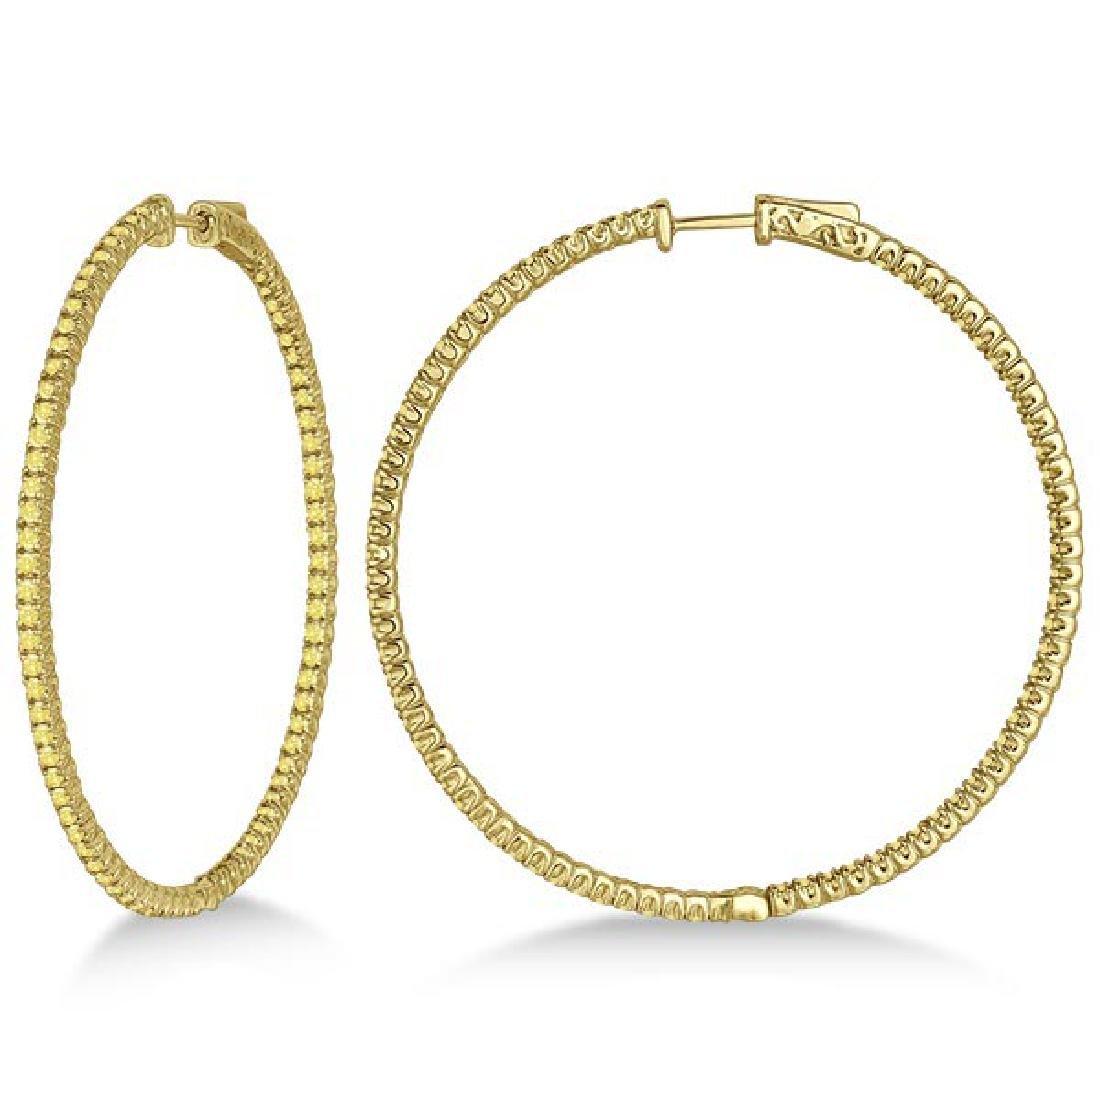 X-Large Yellow Canary Diamond Hoop Earrings 14k Yellow